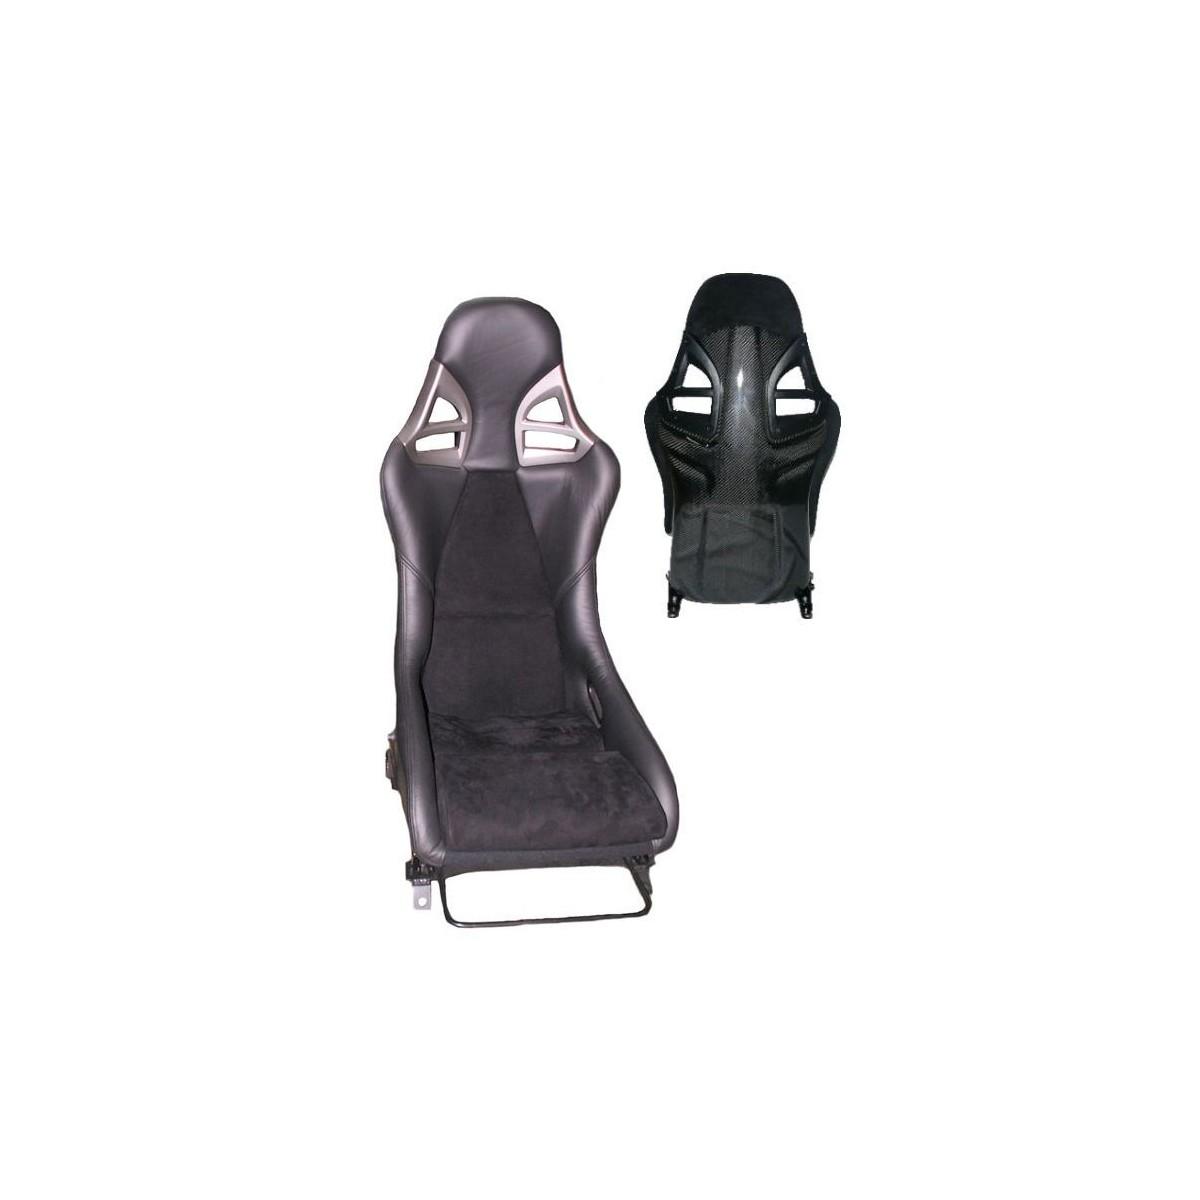 siège baquet style 997 gt3 alcantara-cuir et carbone porsche - cupspirit